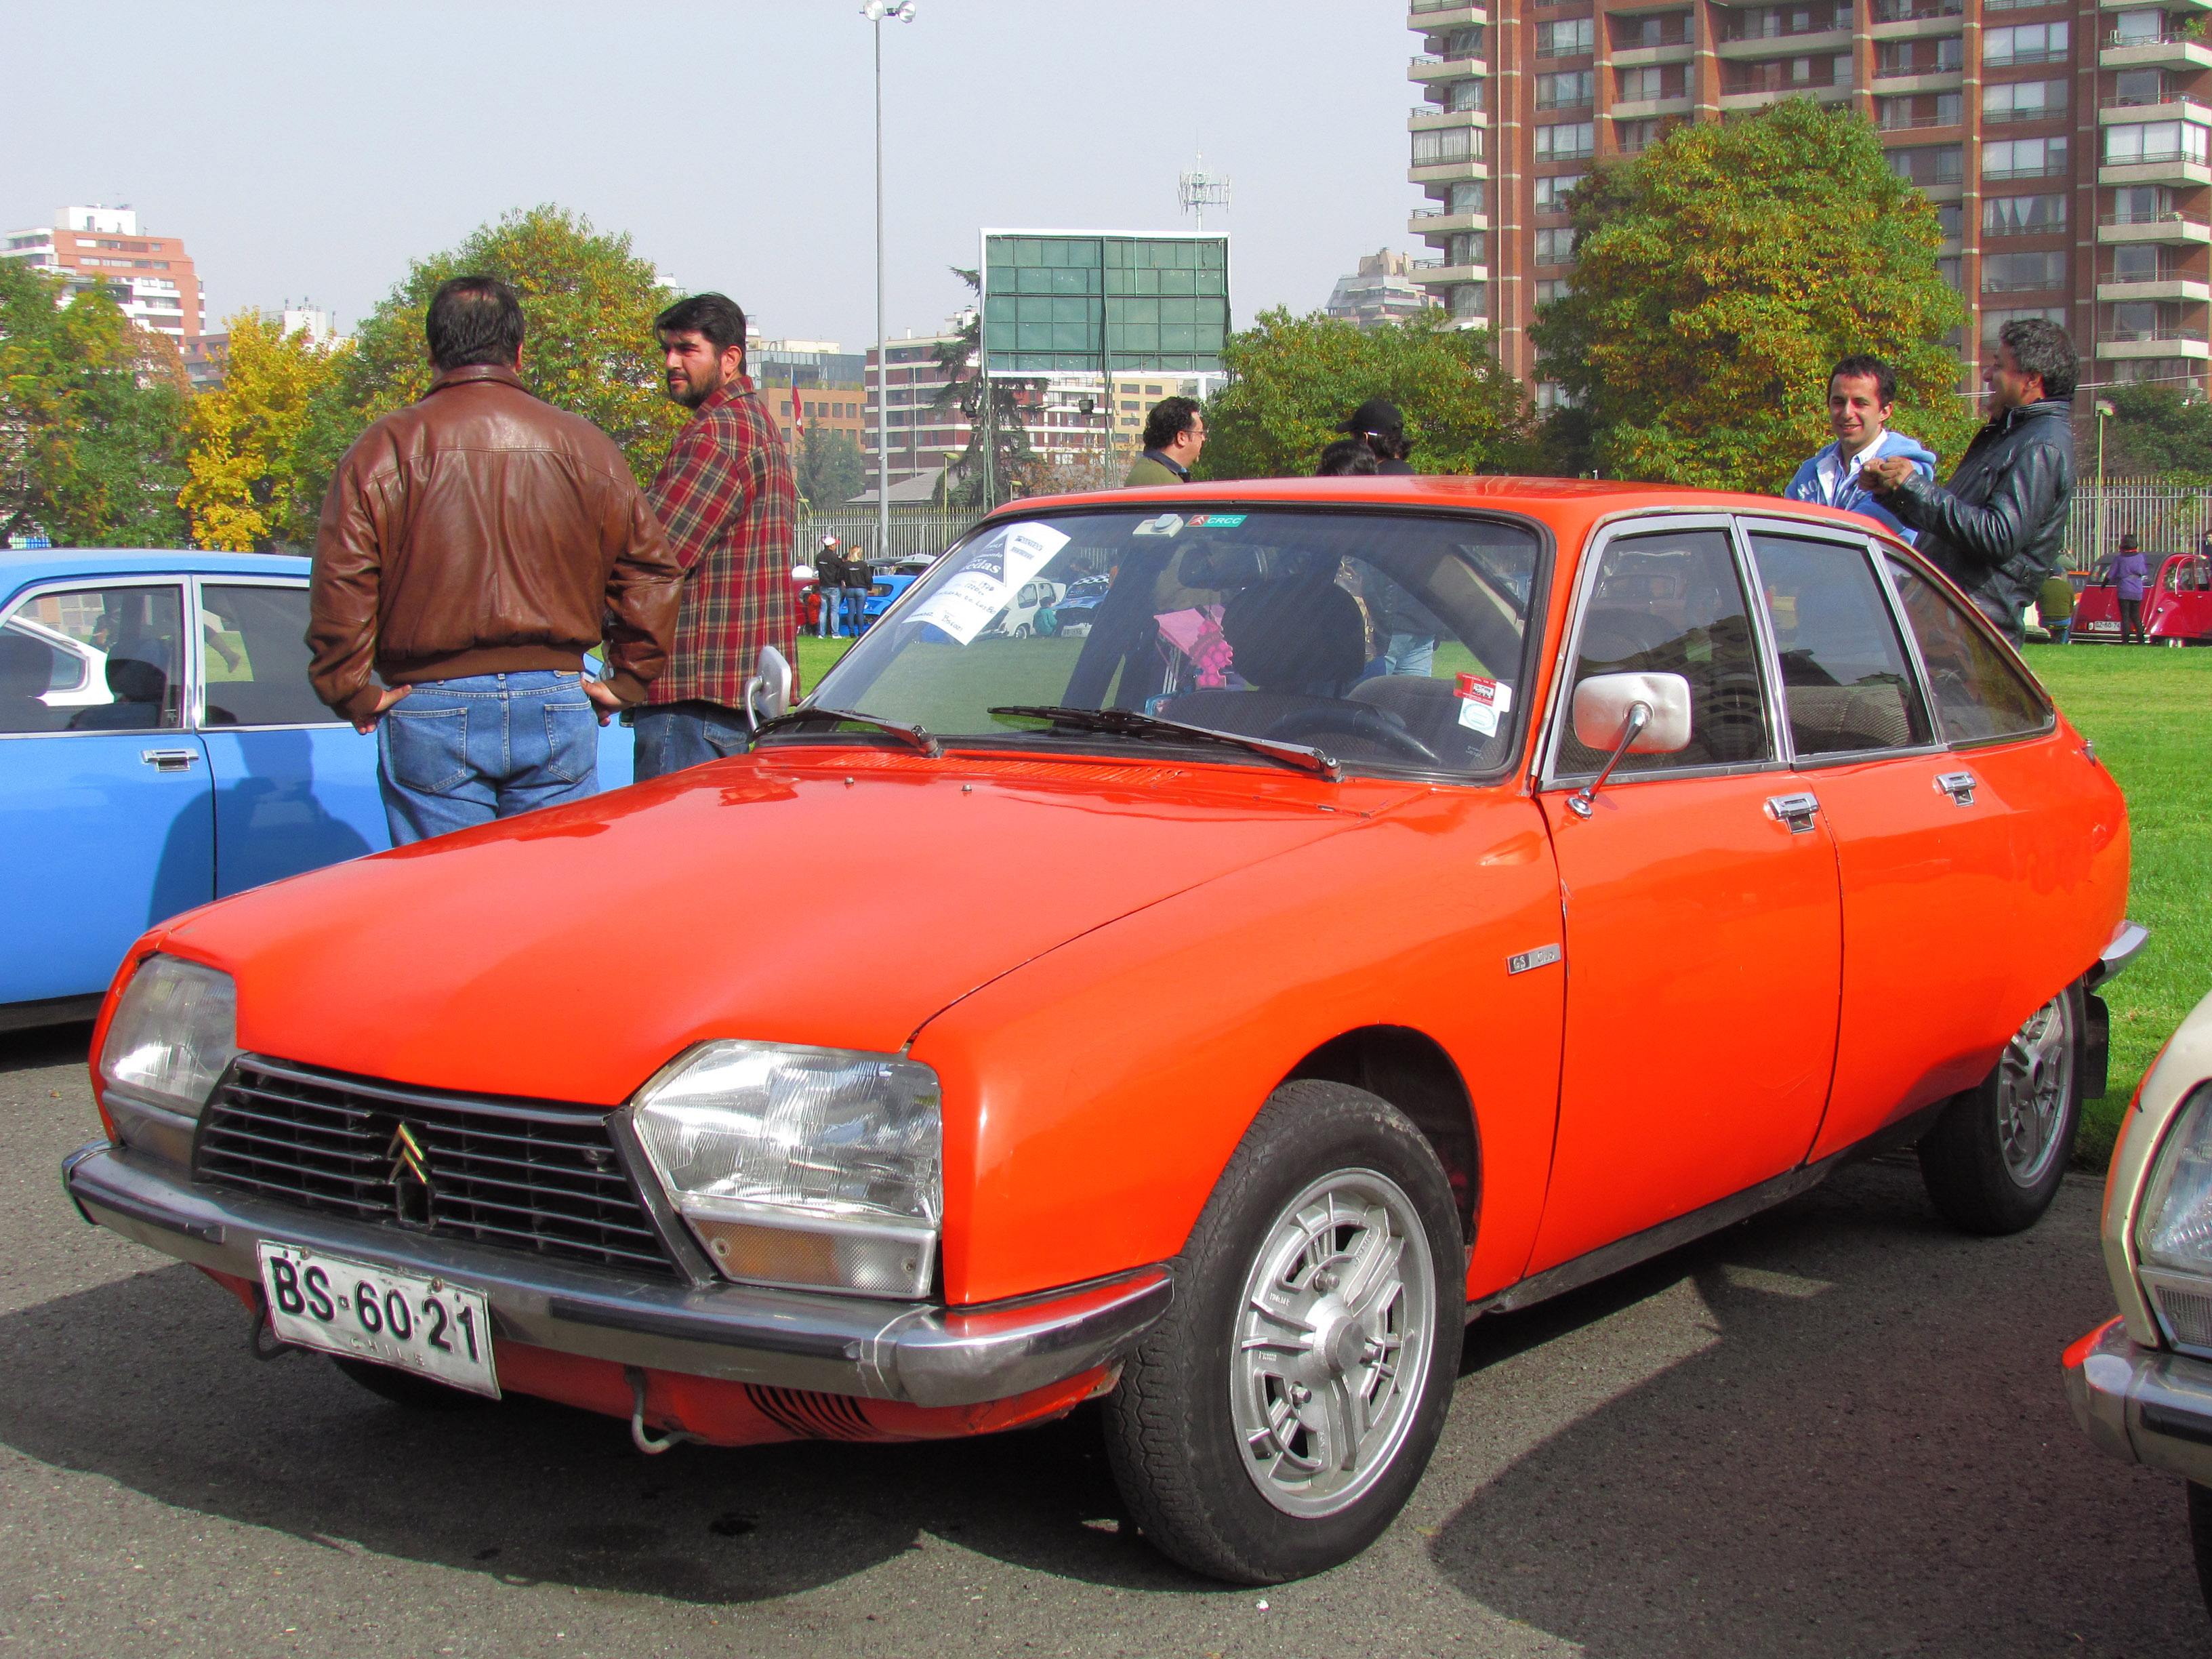 1974 Citroen GS Club Special - Runs & drives great, CX, DS